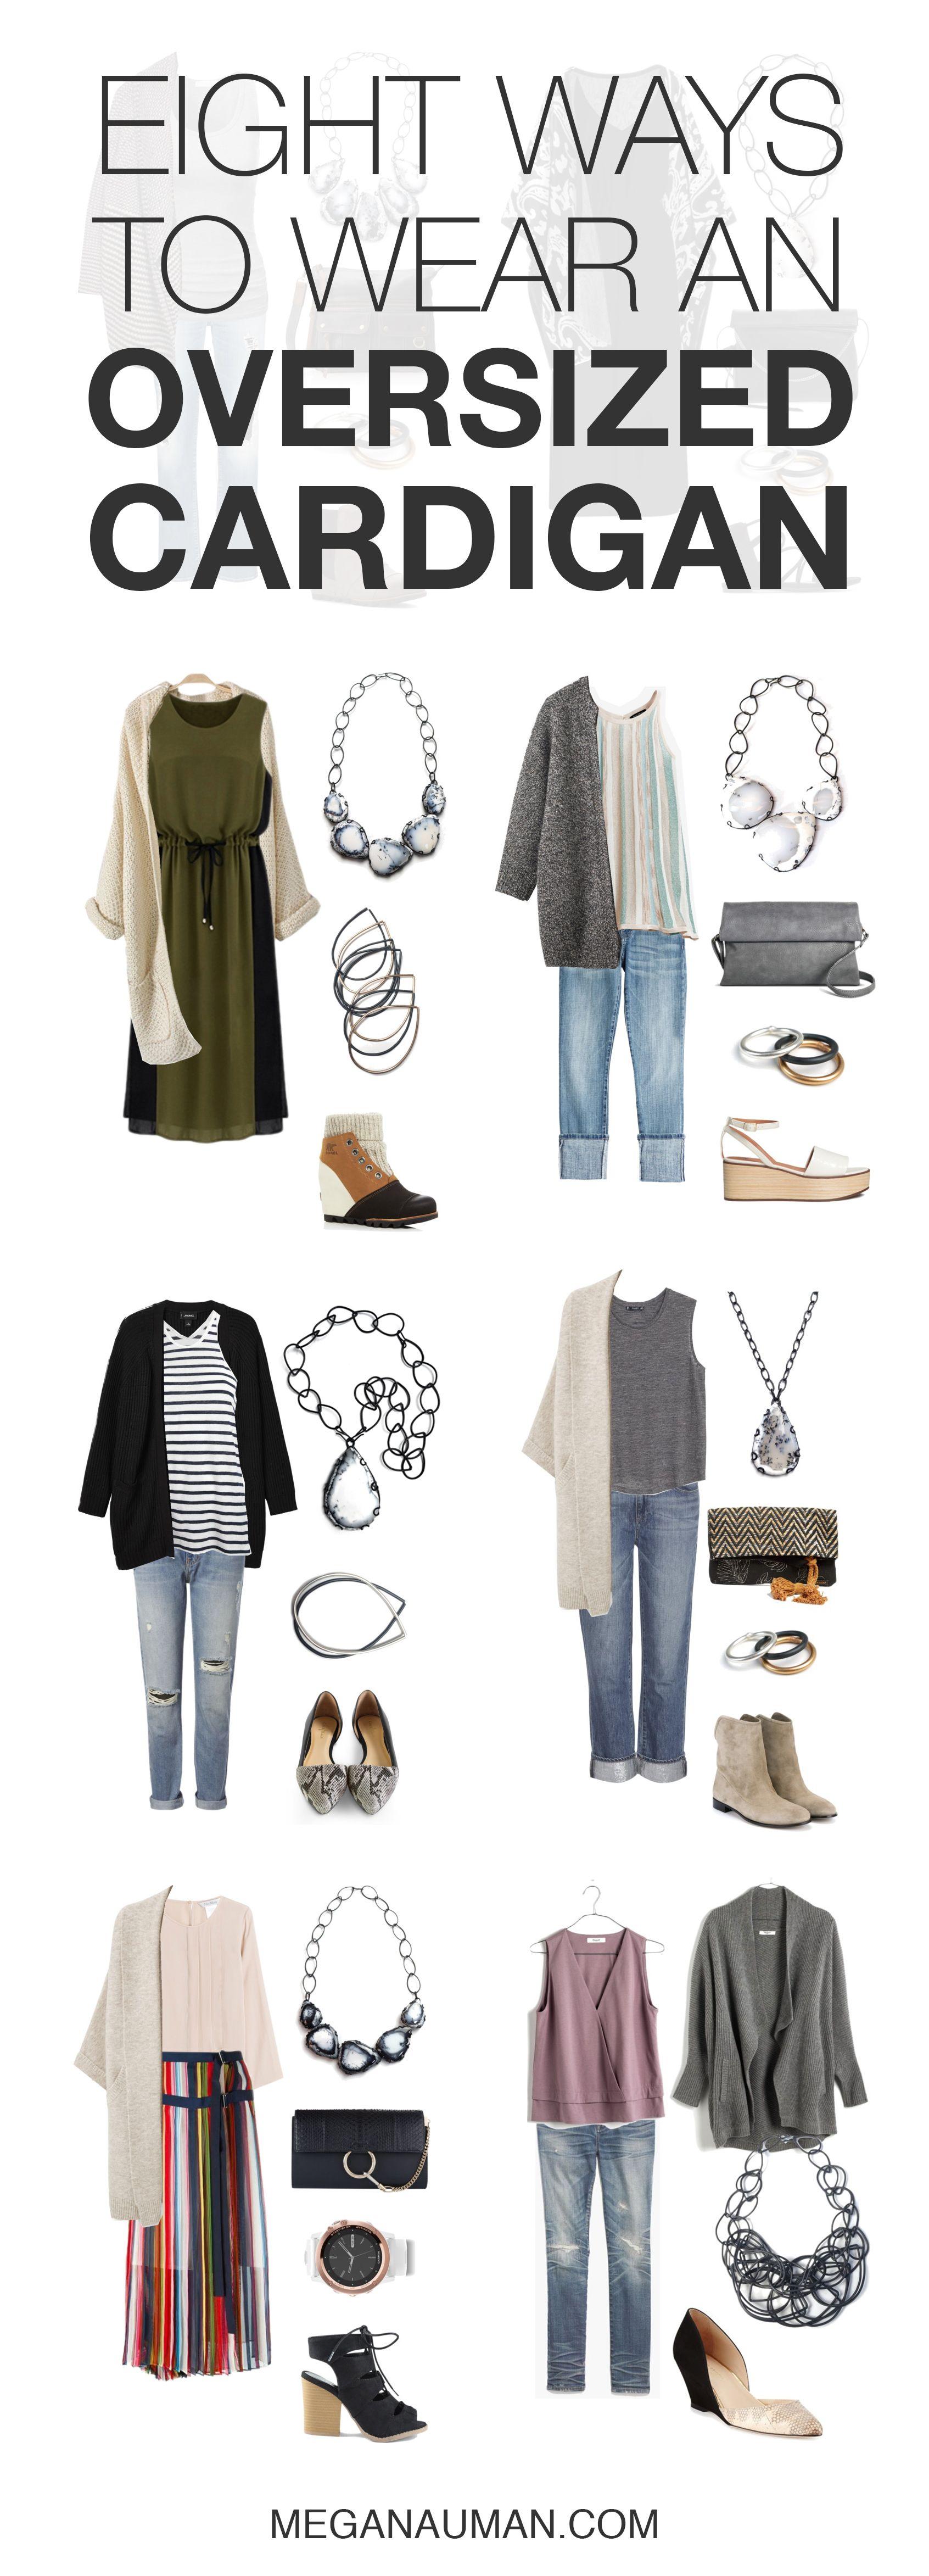 8 ways to wear an oversized cardigan - MEGAN AUMAN